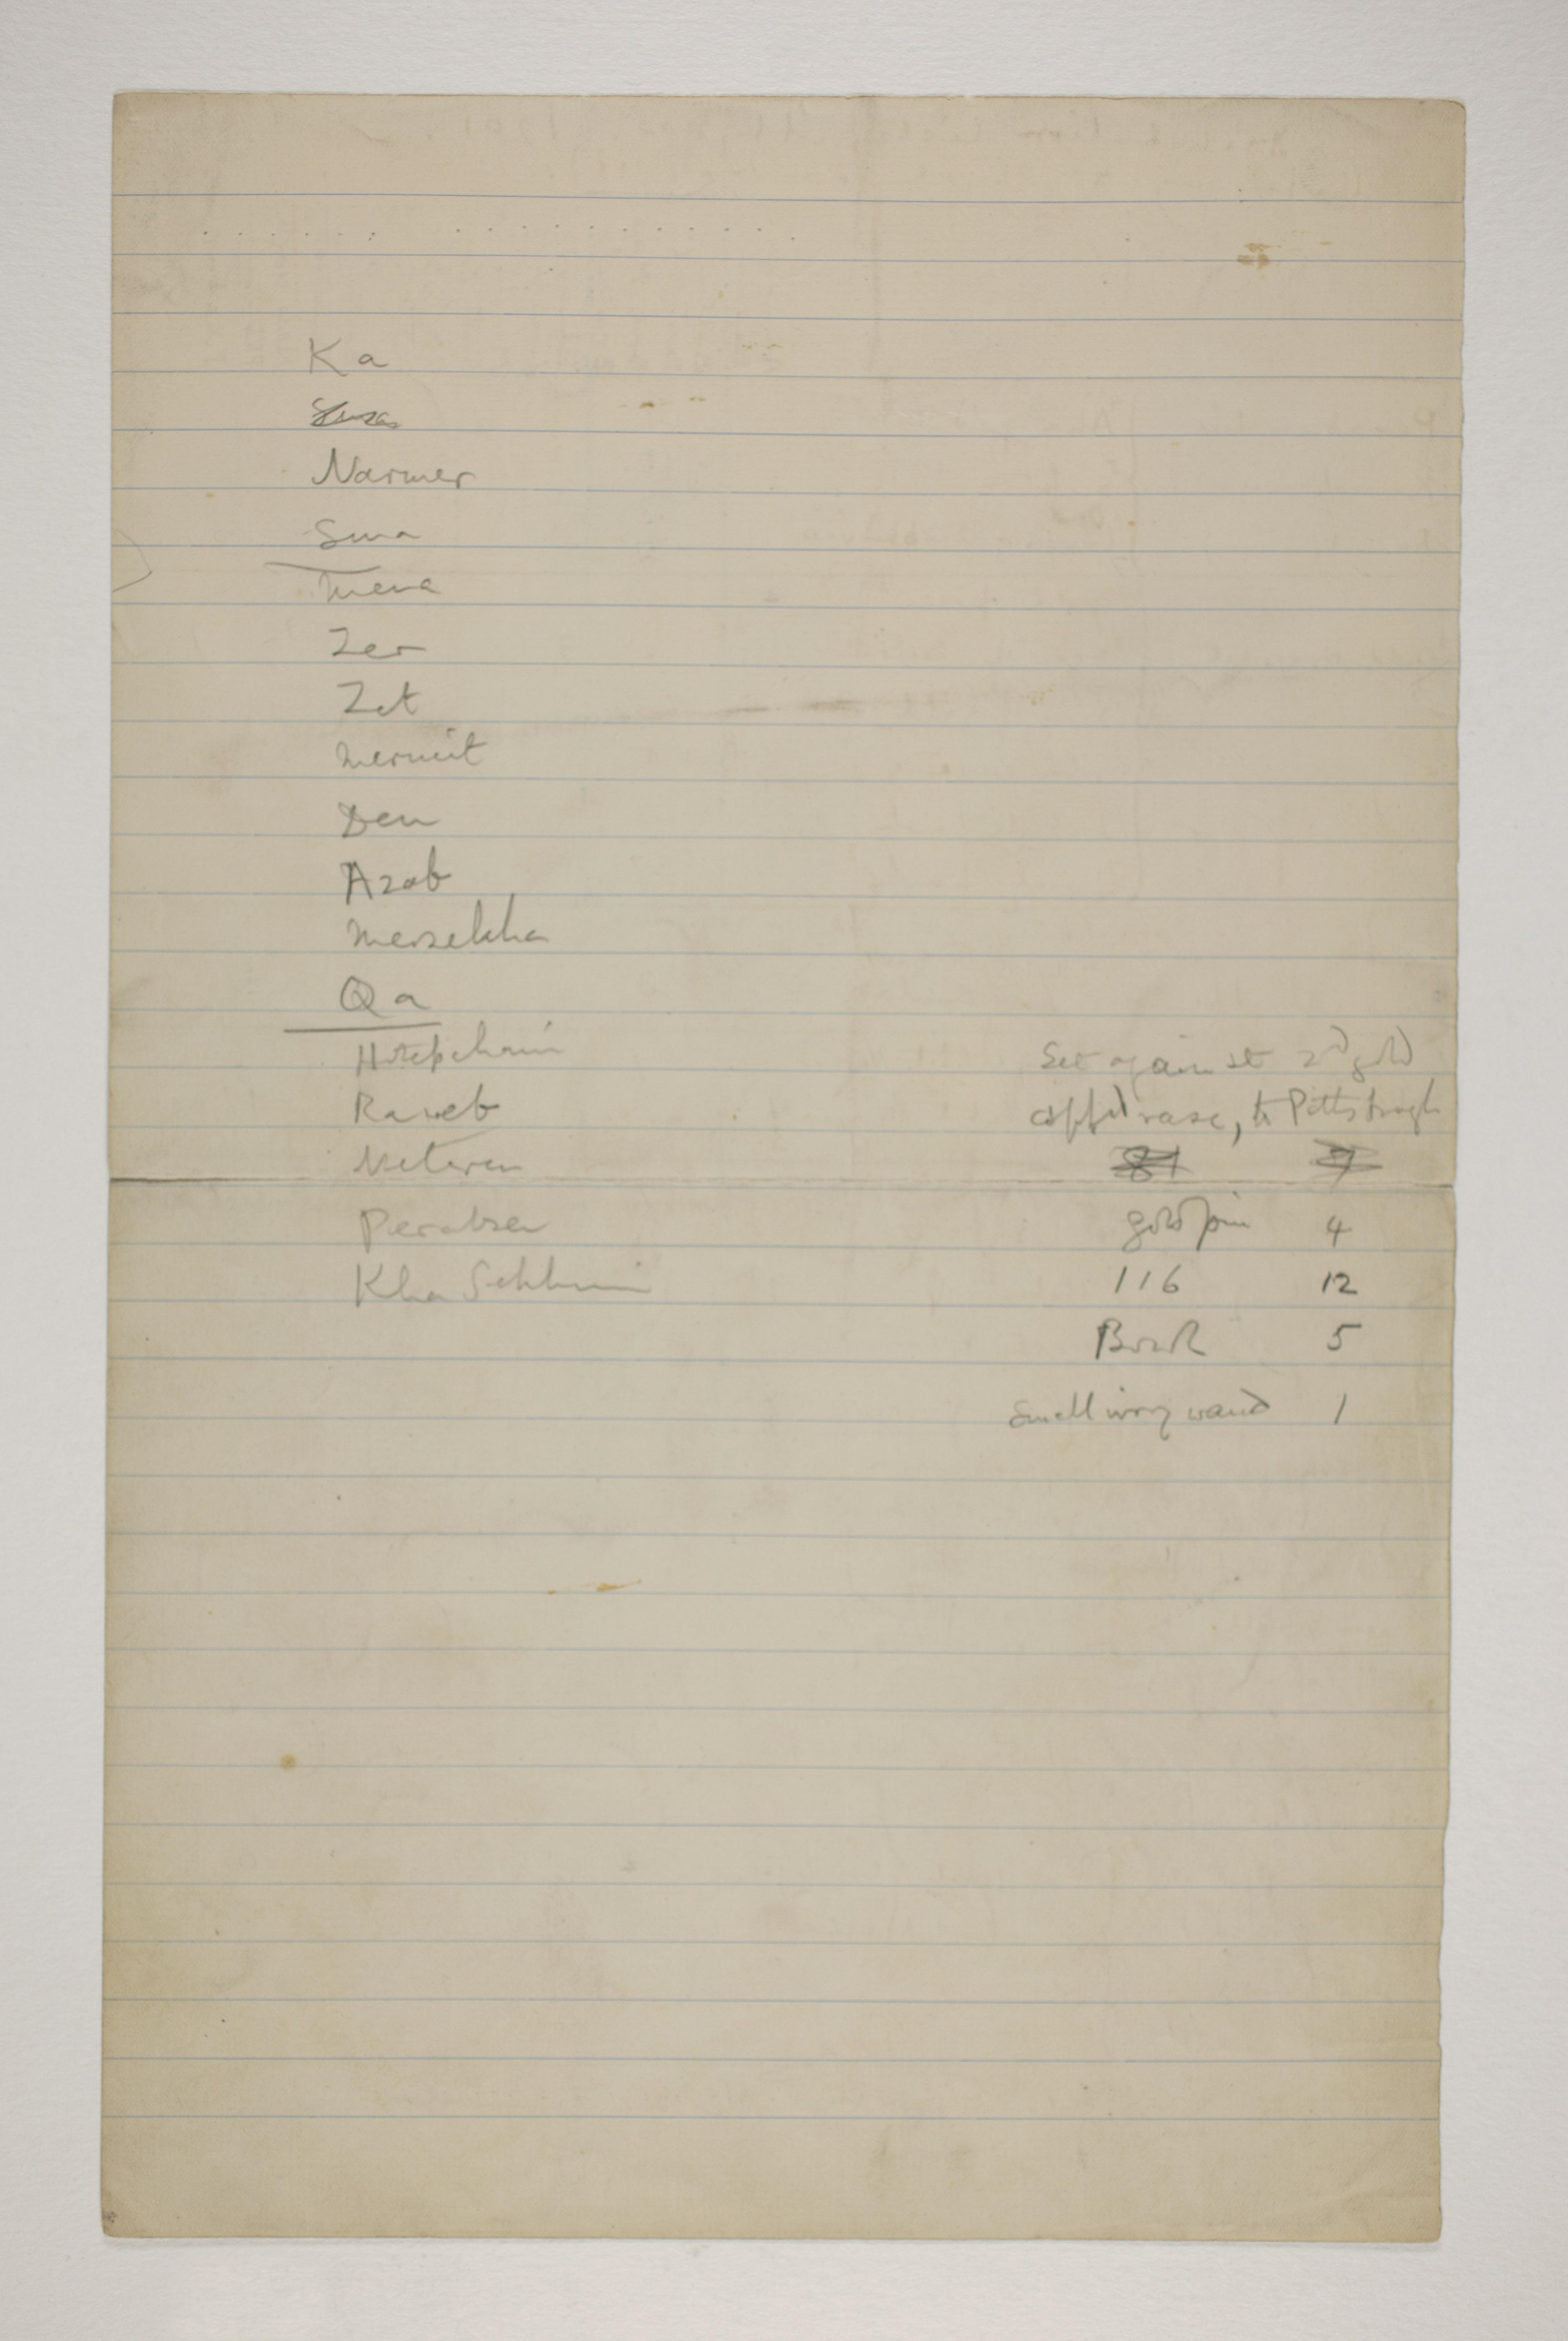 Abydos, Bet Khallaf, el-Mahasna 1900-1901, Distribution List, PMA/WFP1/D/9/5.2